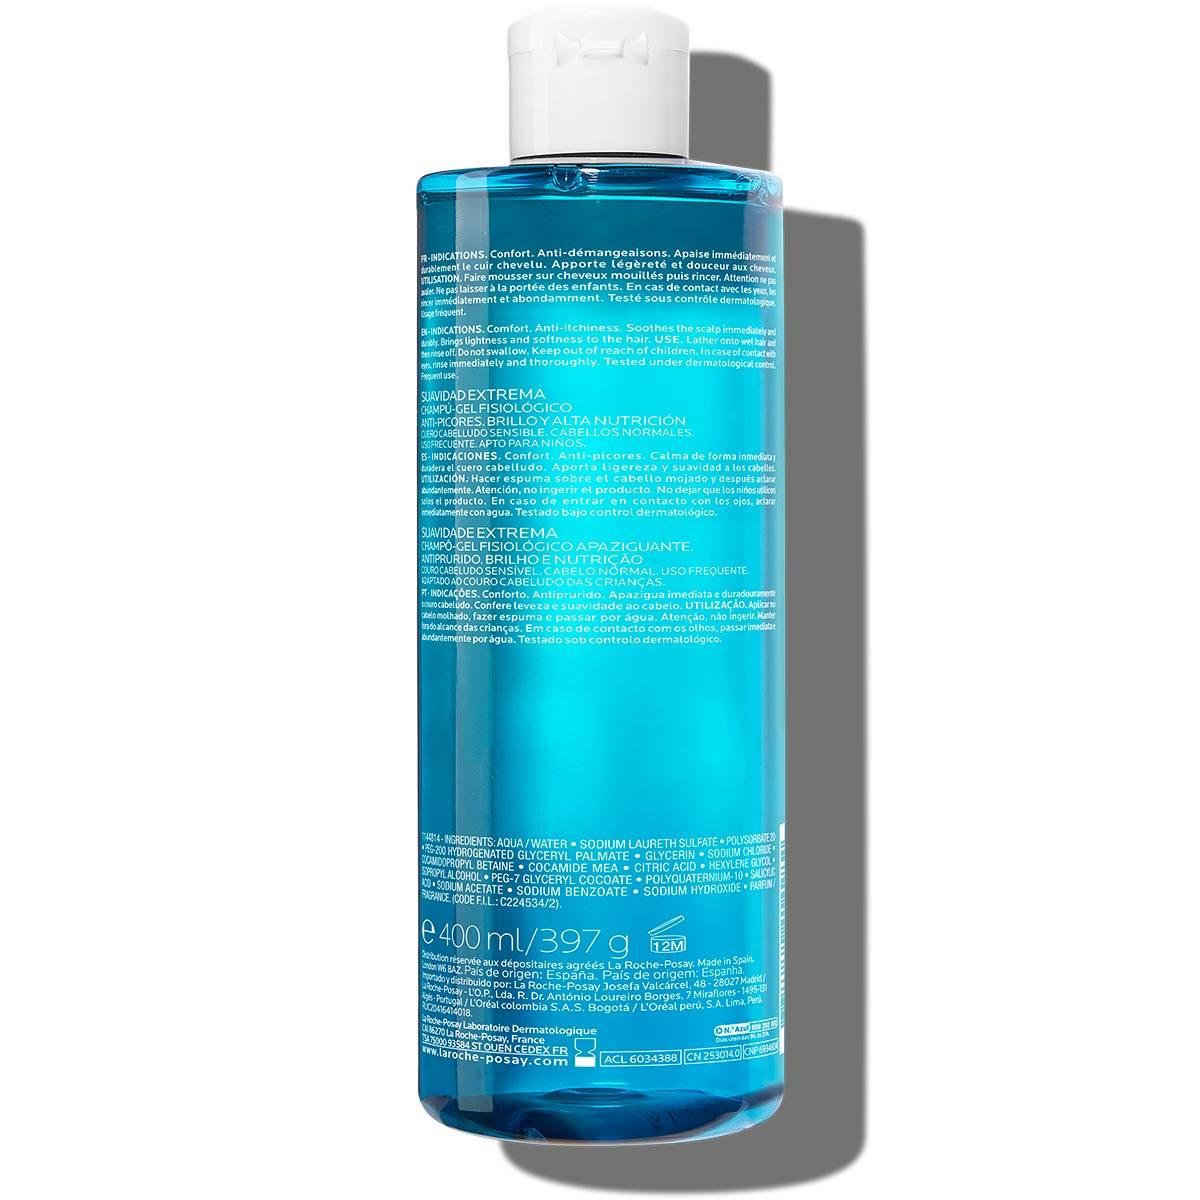 La Roche Posay ProductPage Kerium Extra Gentle Gel Shampoo 400ml 33378